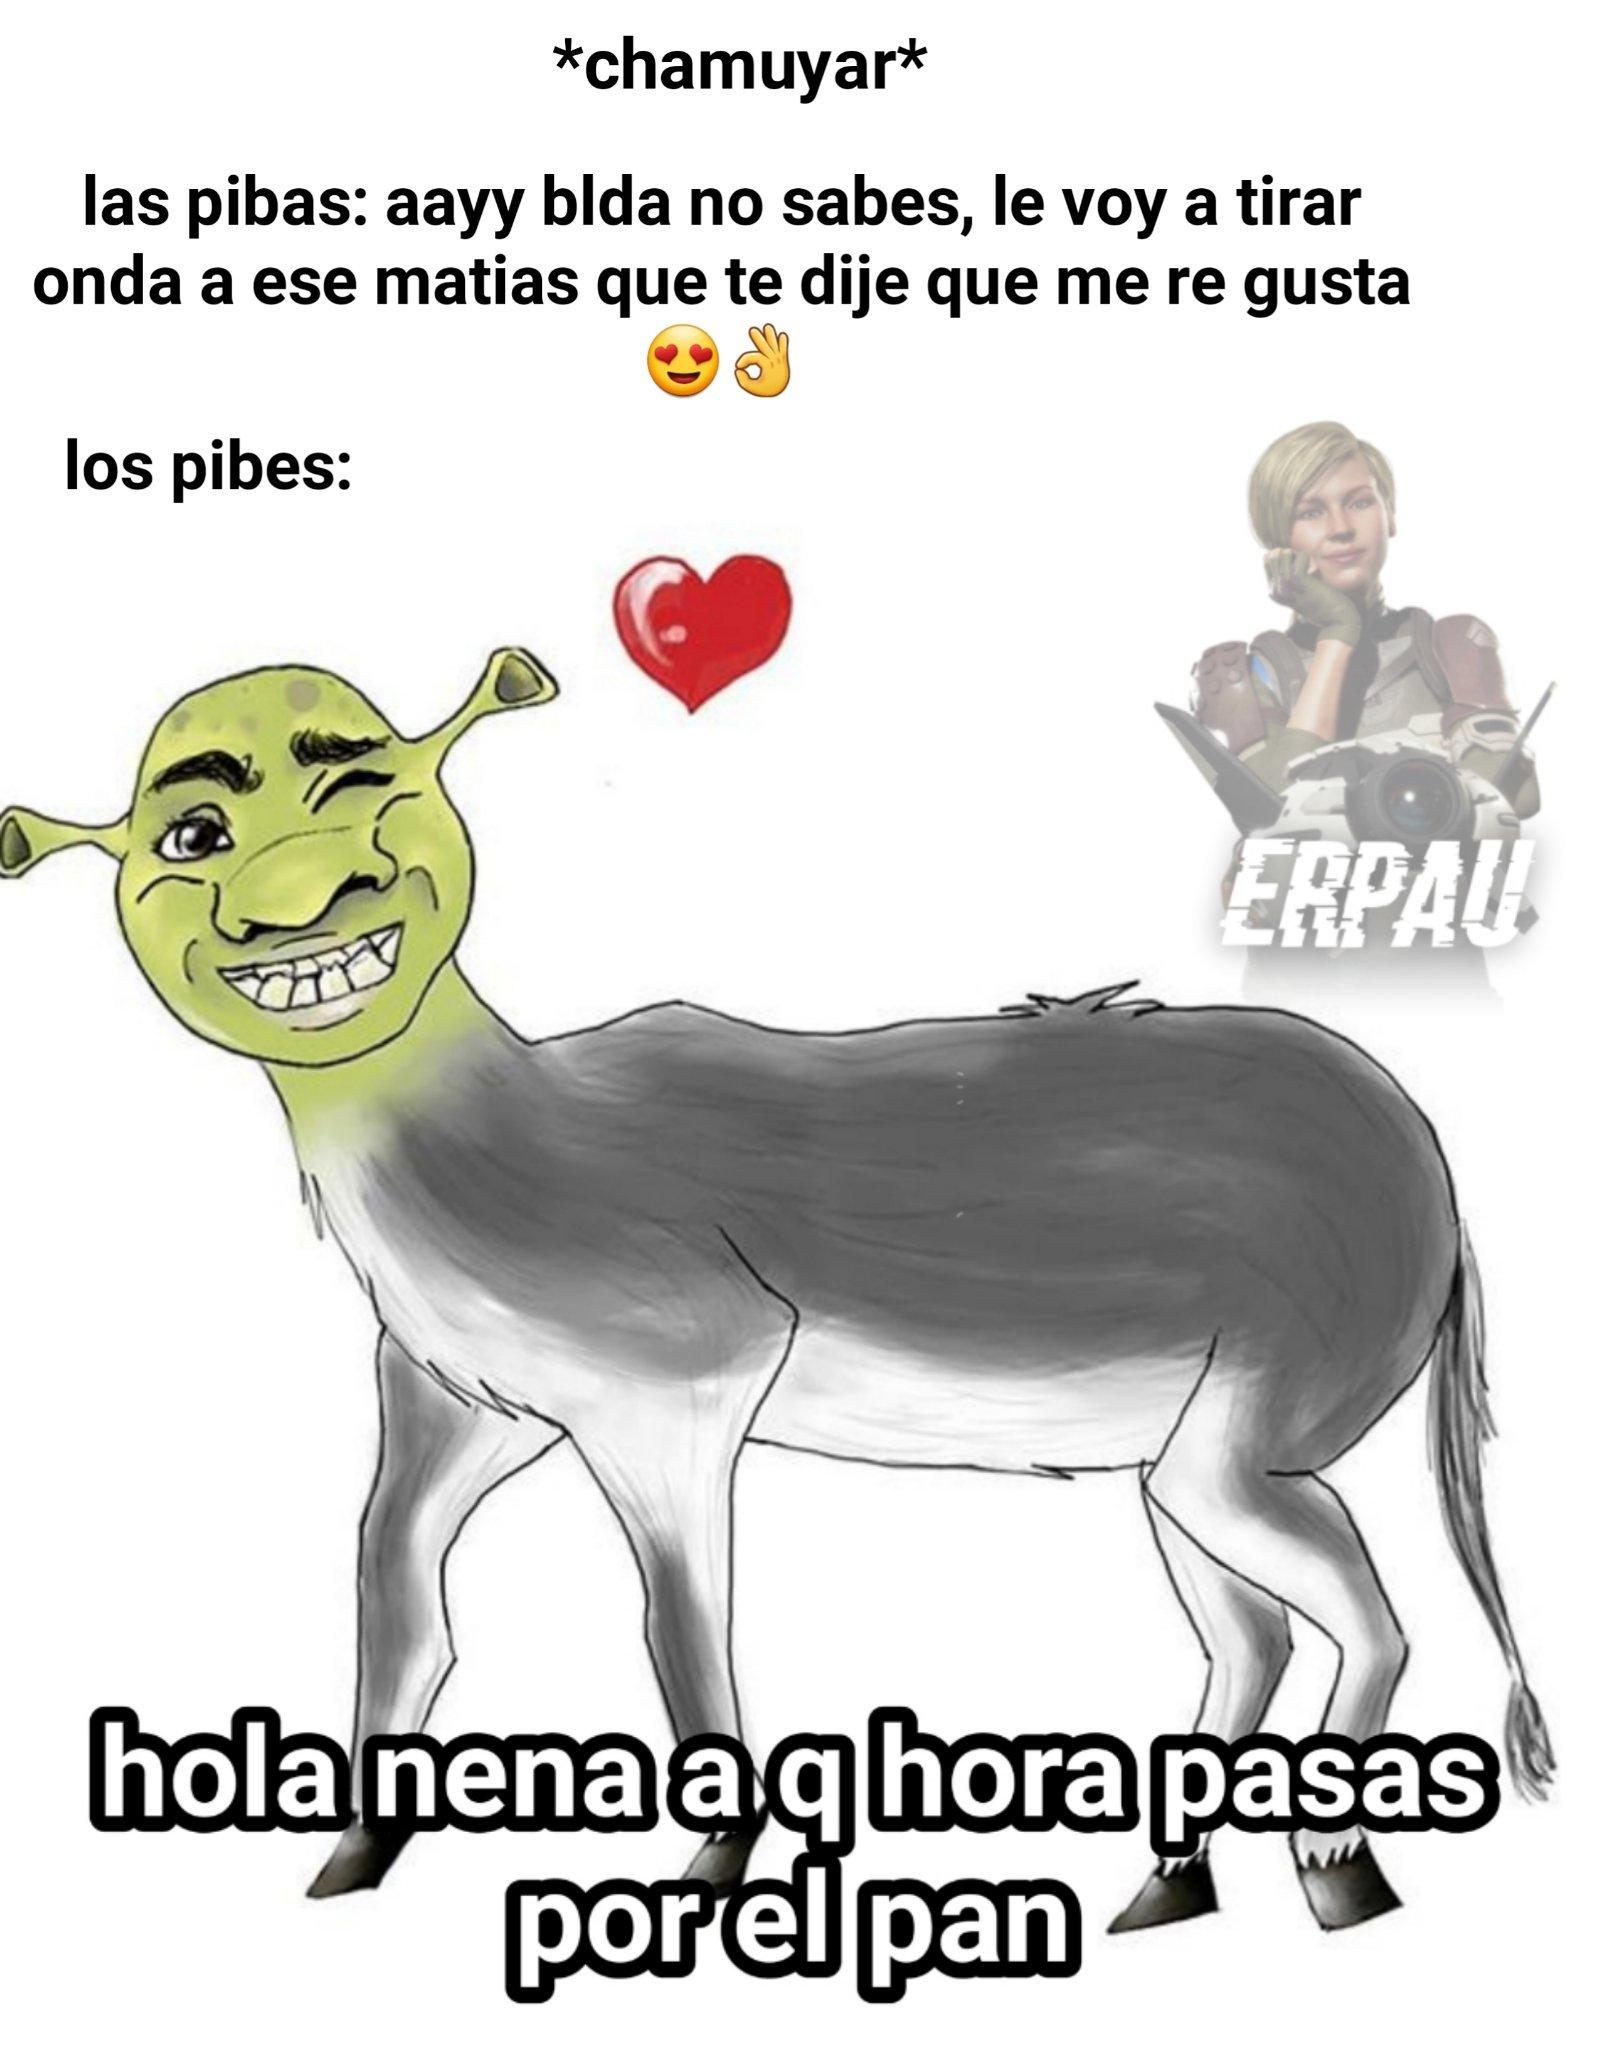 NOOO SHREK FURRO, ESO NO ES DE CRACKS :weeynooo: - meme